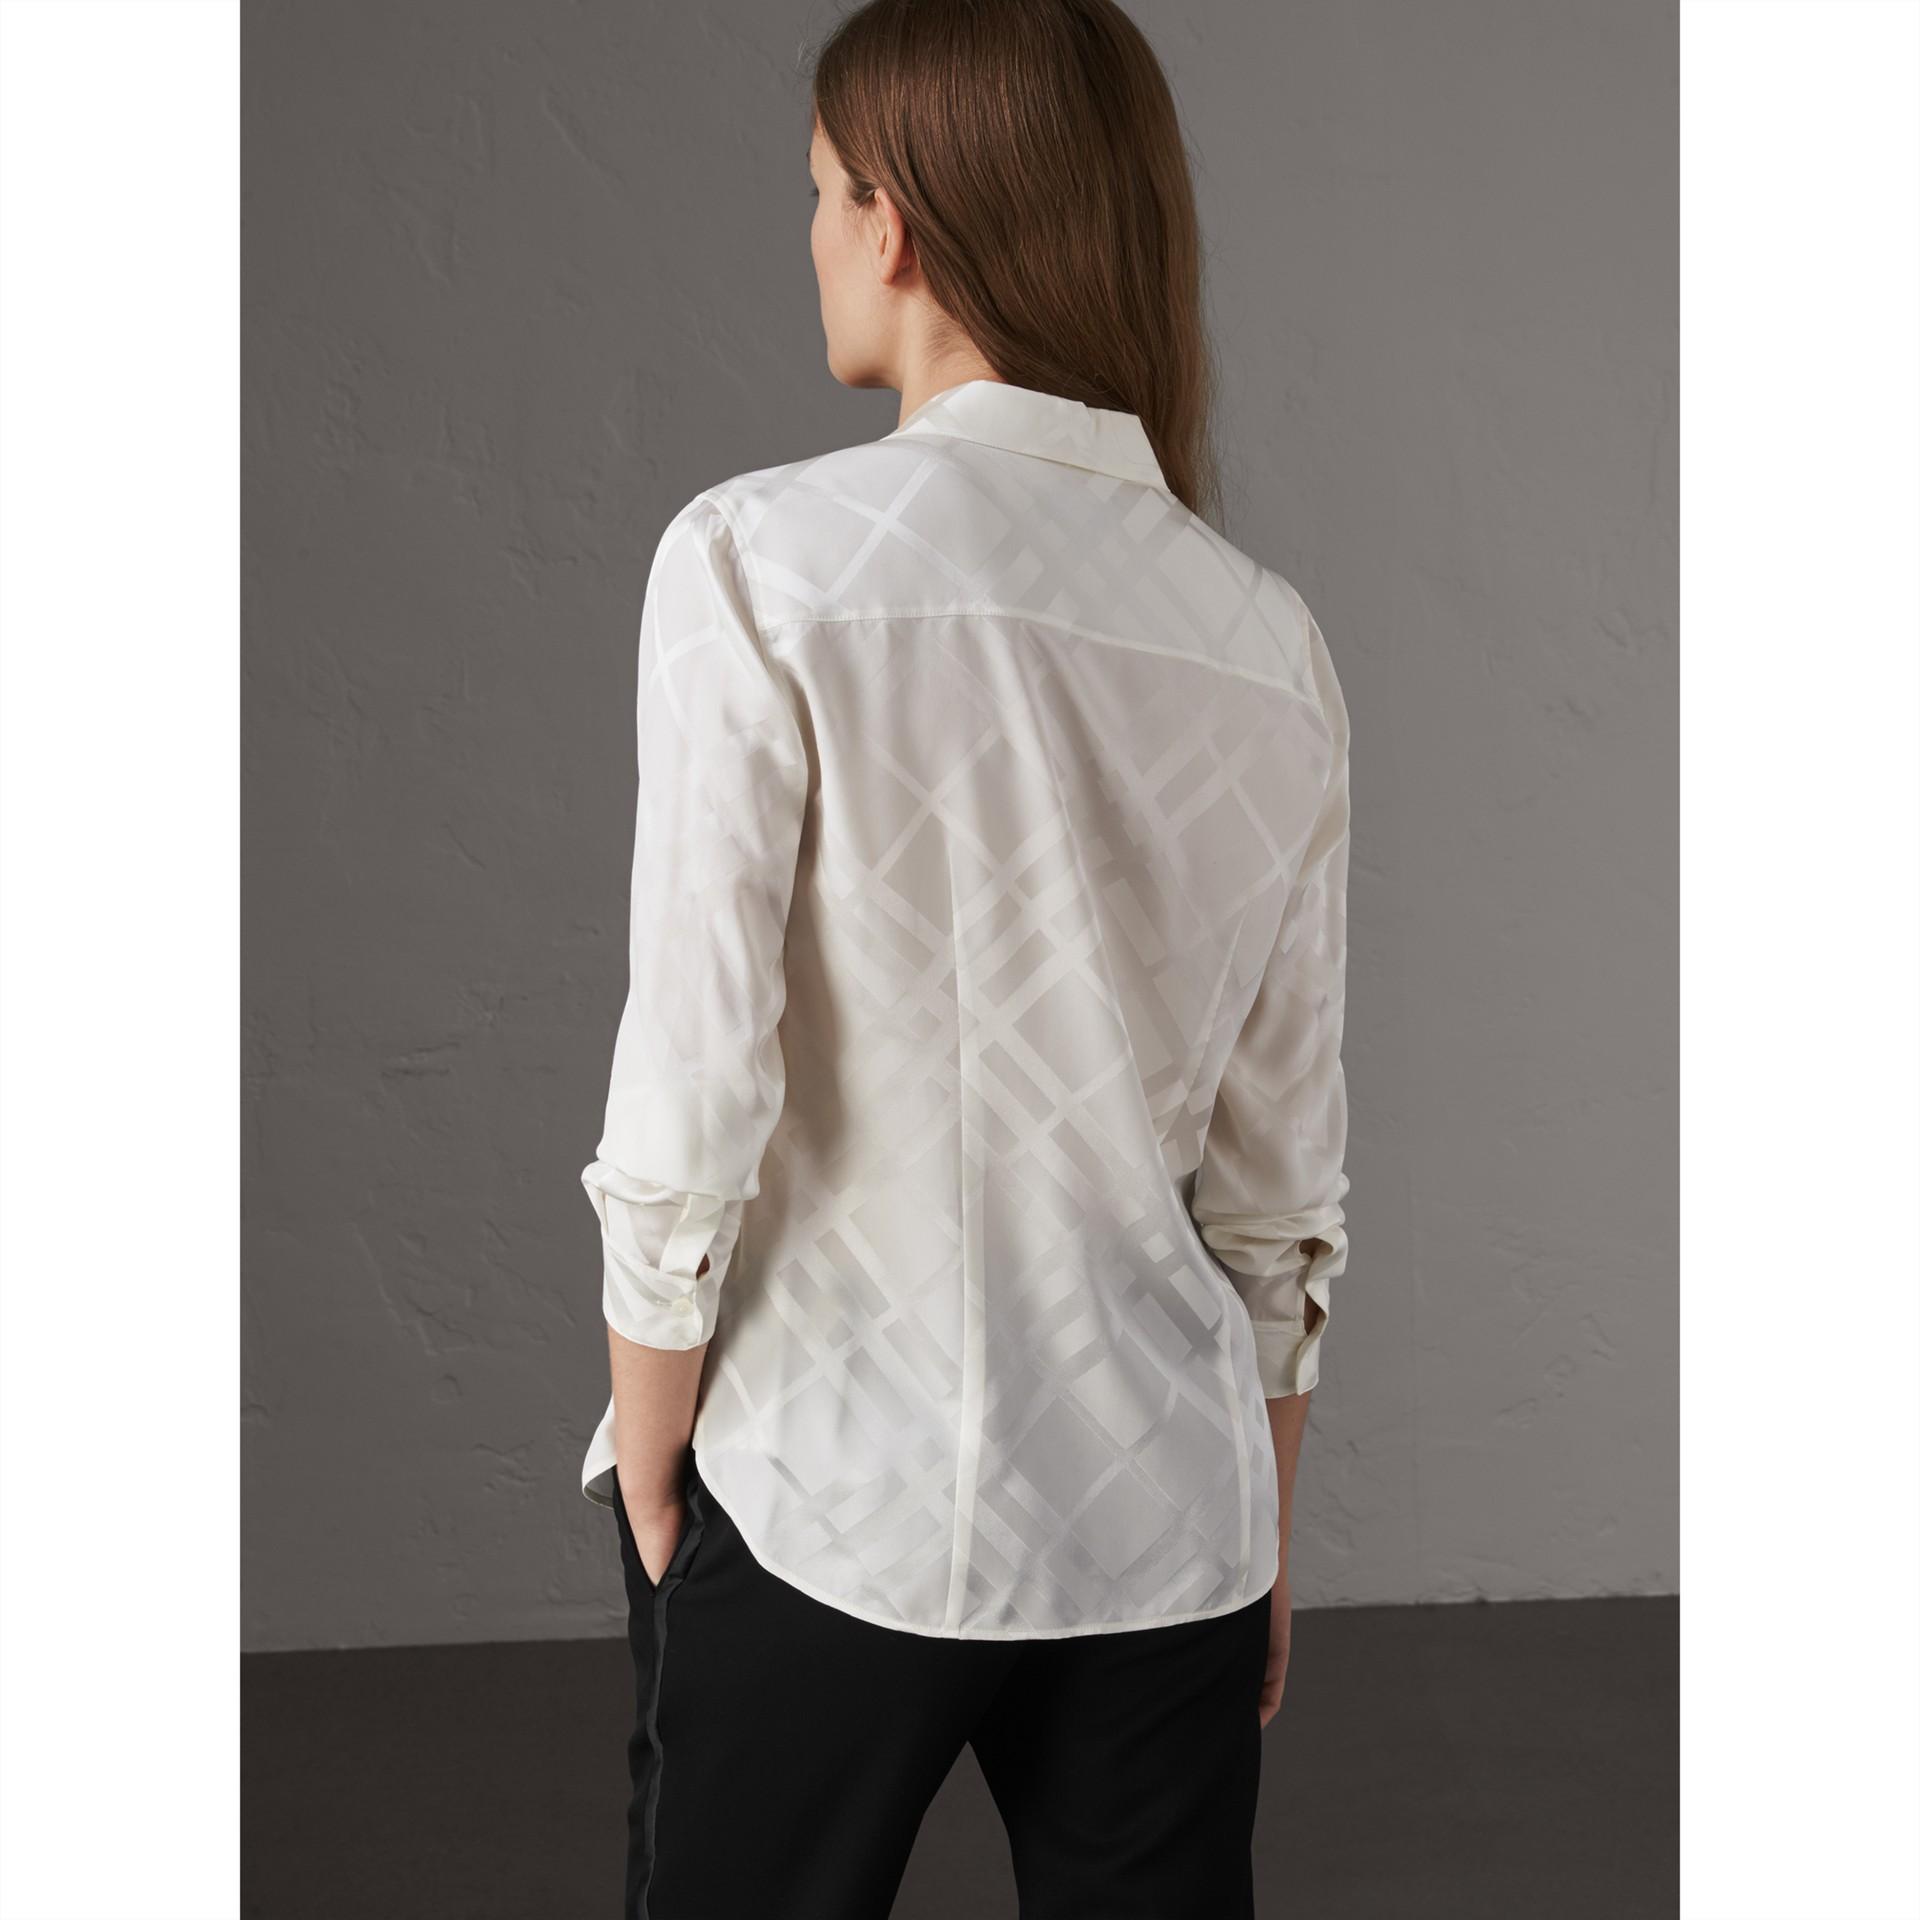 Tonal Check Silk Shirt in White - Women | Burberry Canada - gallery image 3